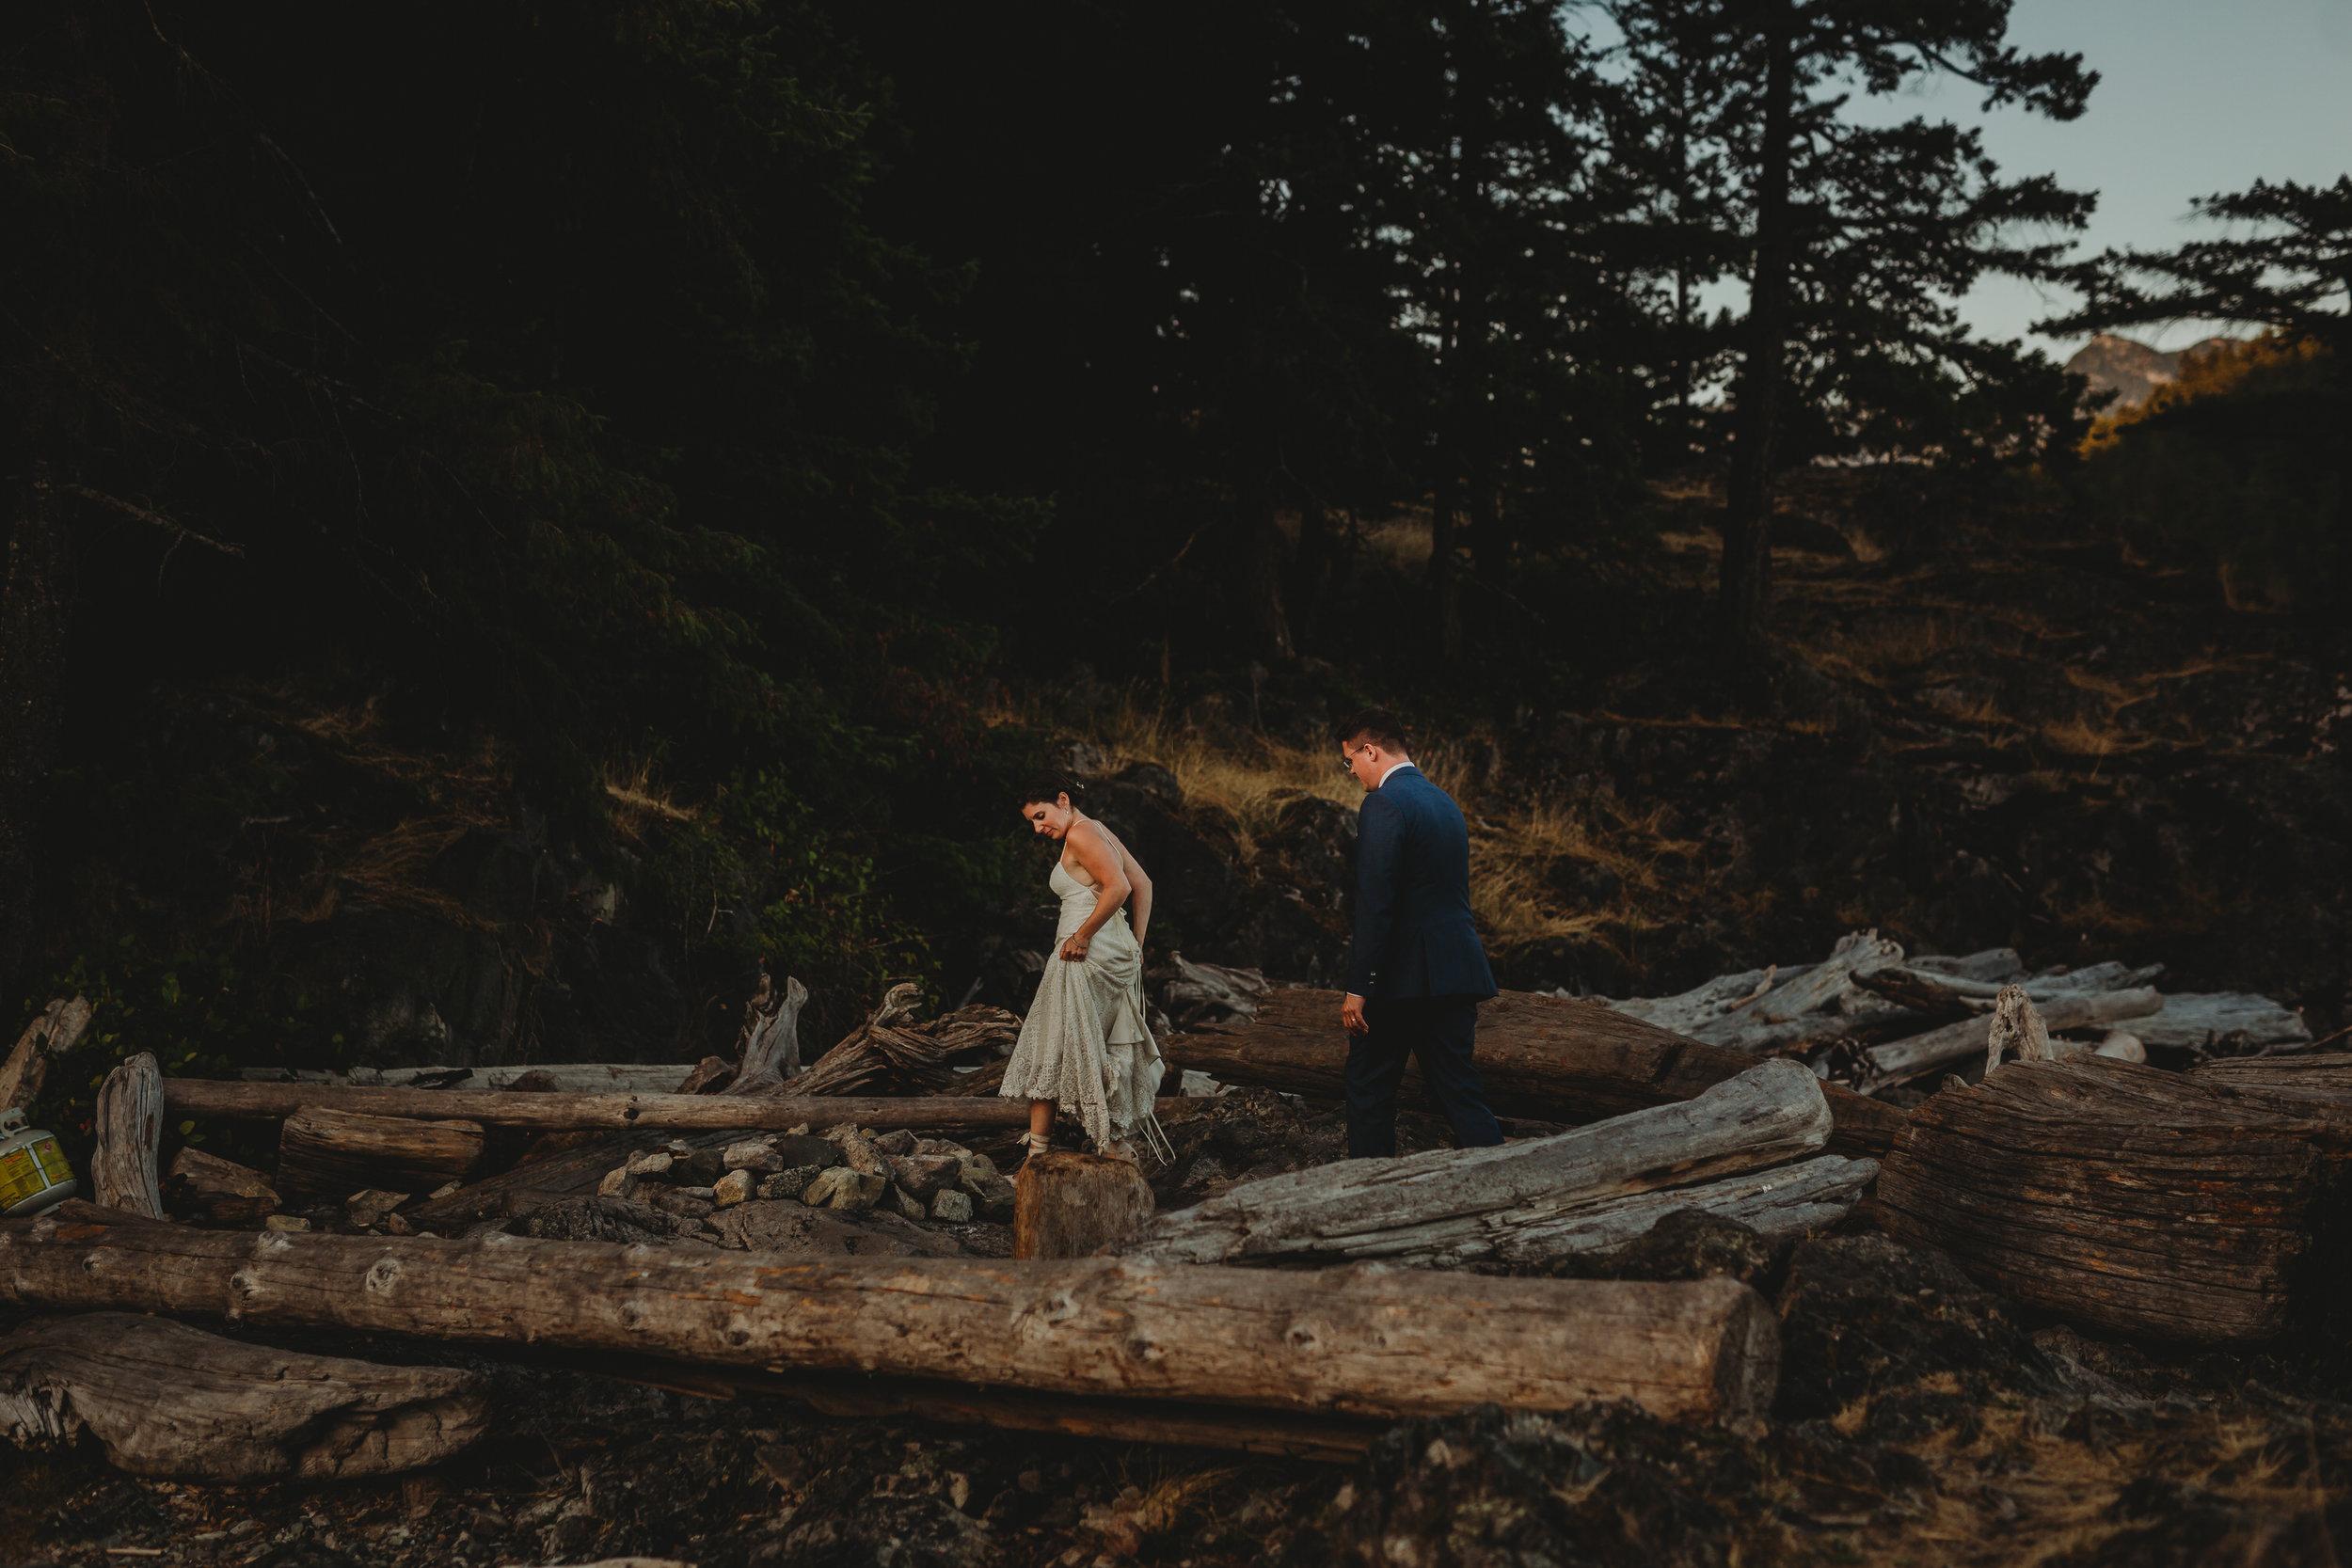 Camp Fircom Wedding - Vancouver Wedding Photographer & Videographer - Sunshine Coast Wedding Photos - Sunshine Coast Wedding Photographer - Jennifer Picard Photography - IMG_1496.jpg